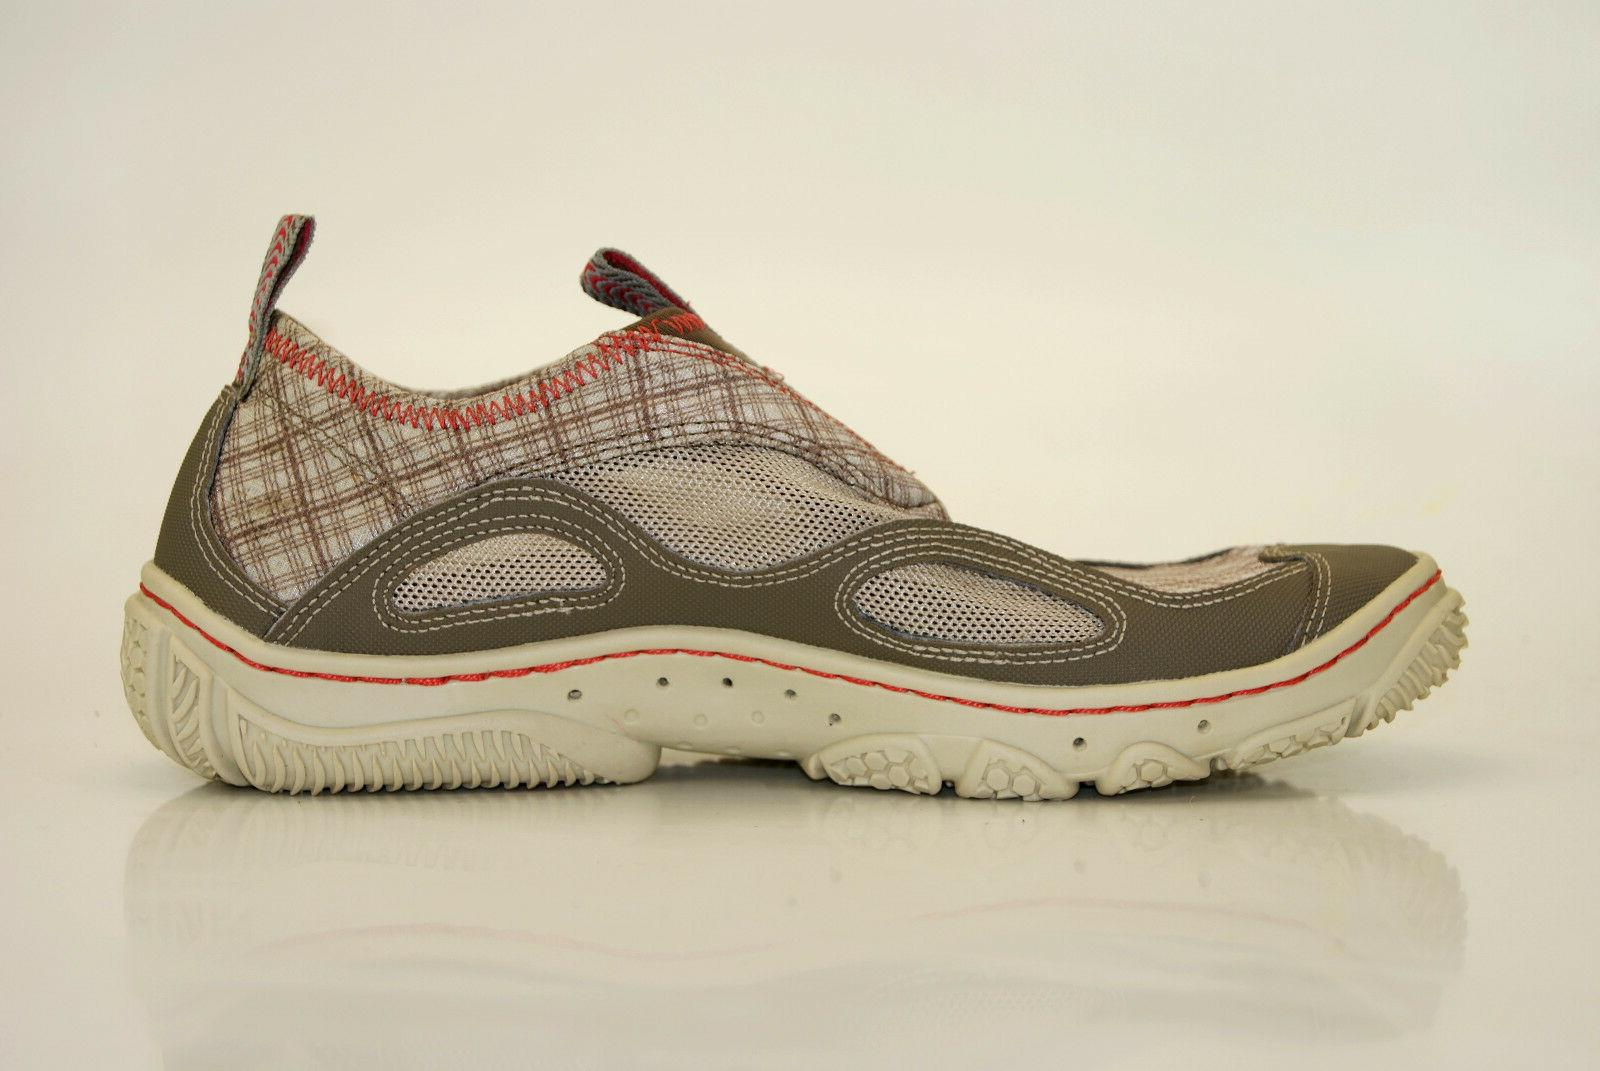 Timberland Beach Shoes Trekking